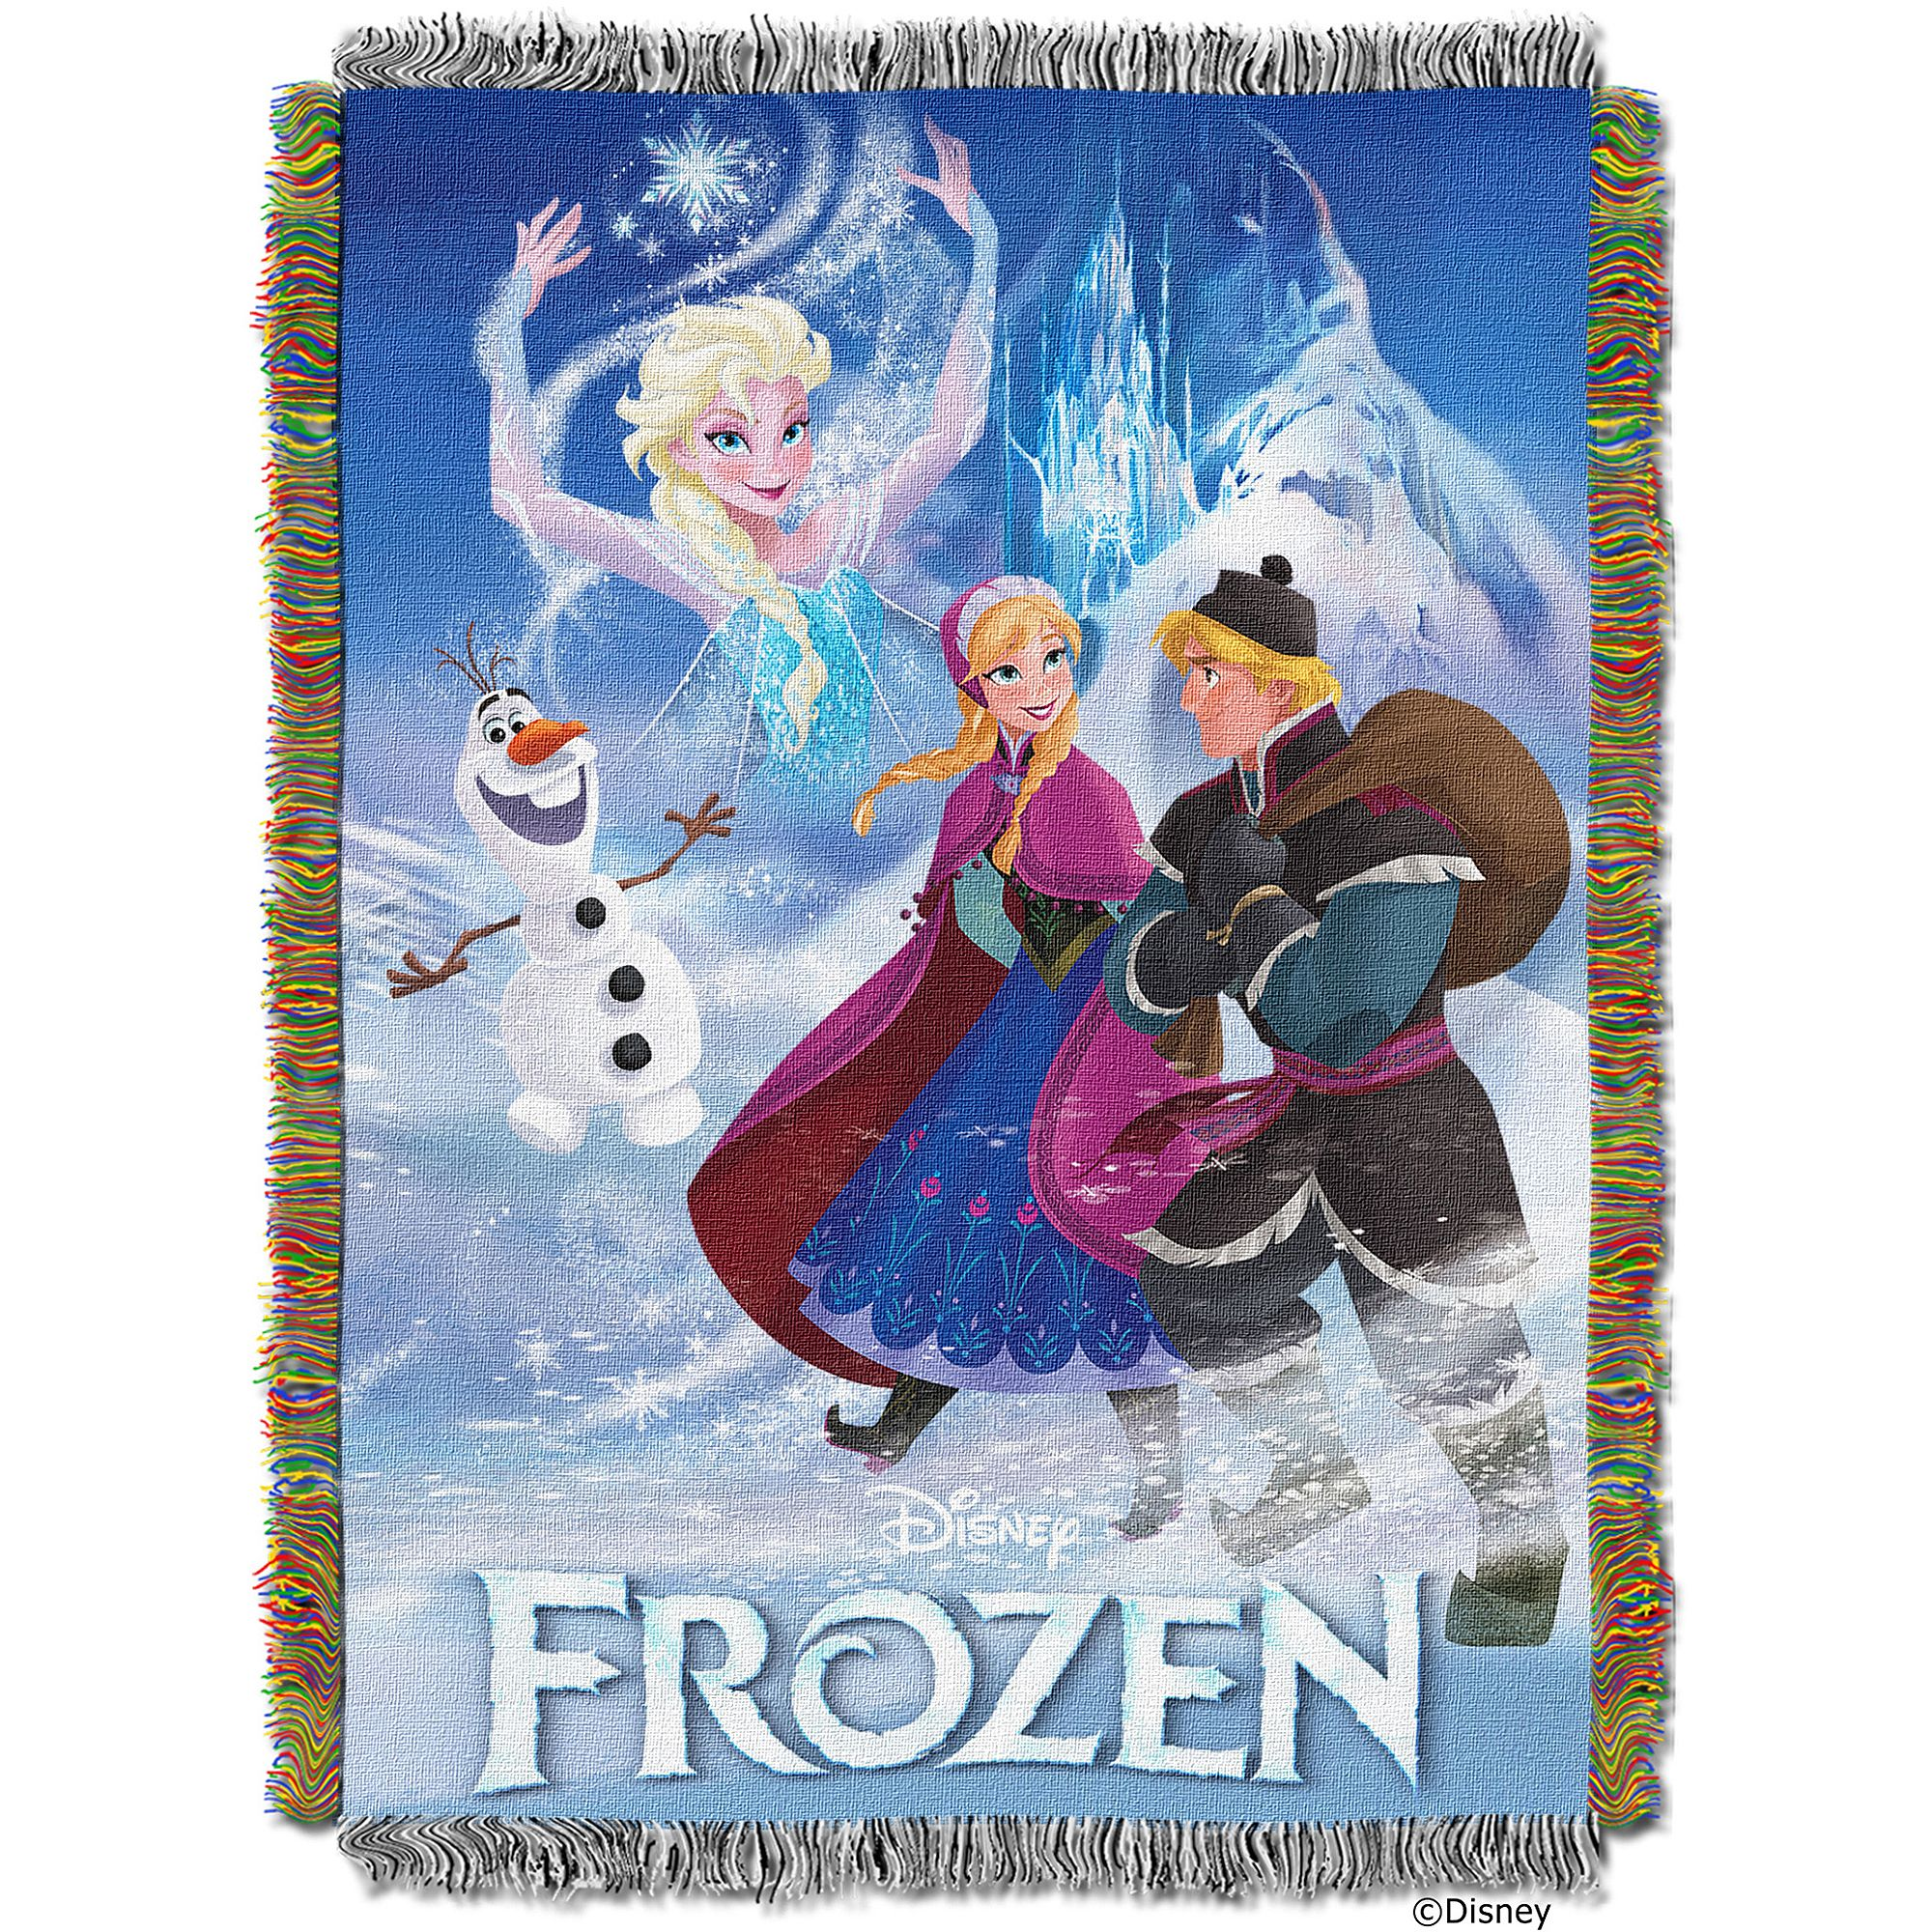 "Disney's Frozen Storybook 48"" x 60"" Tapestry Throw"